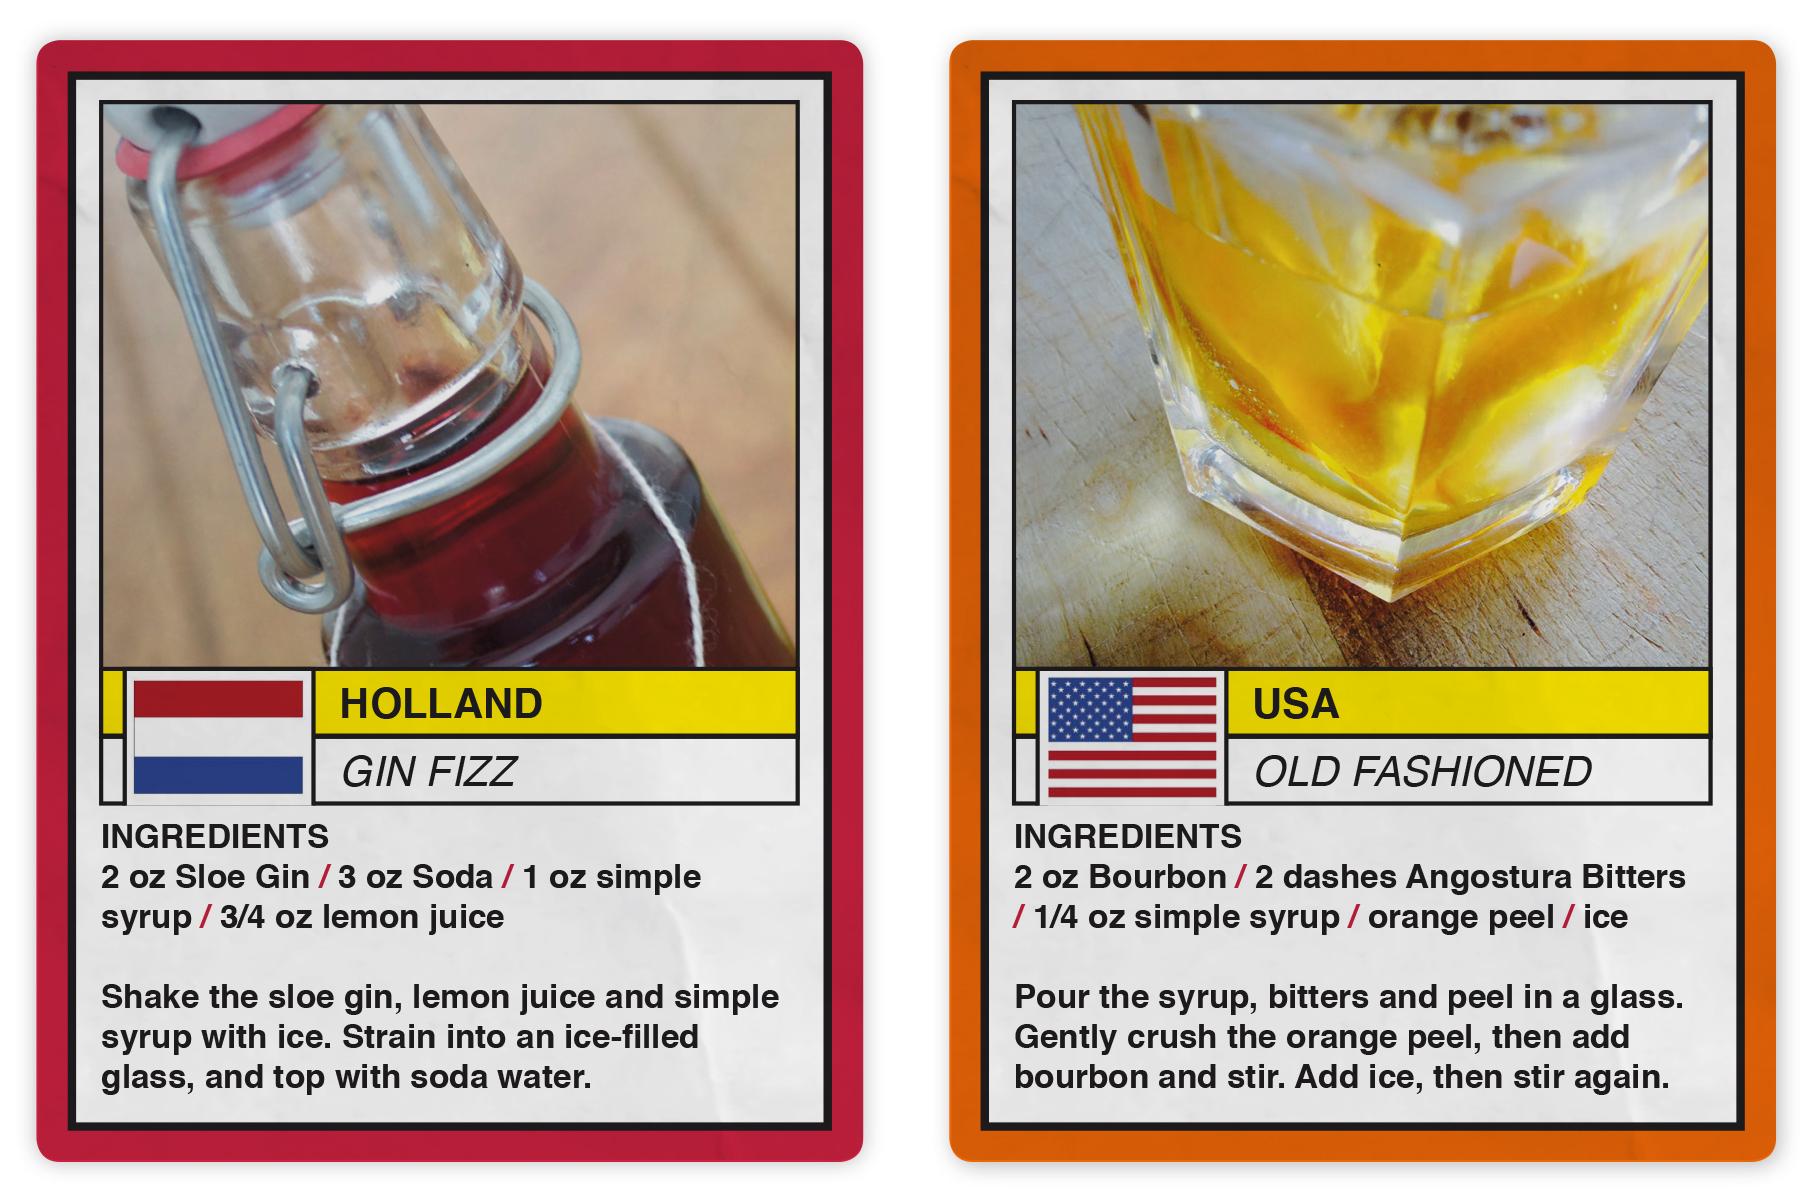 Holland_USA recipe sticker